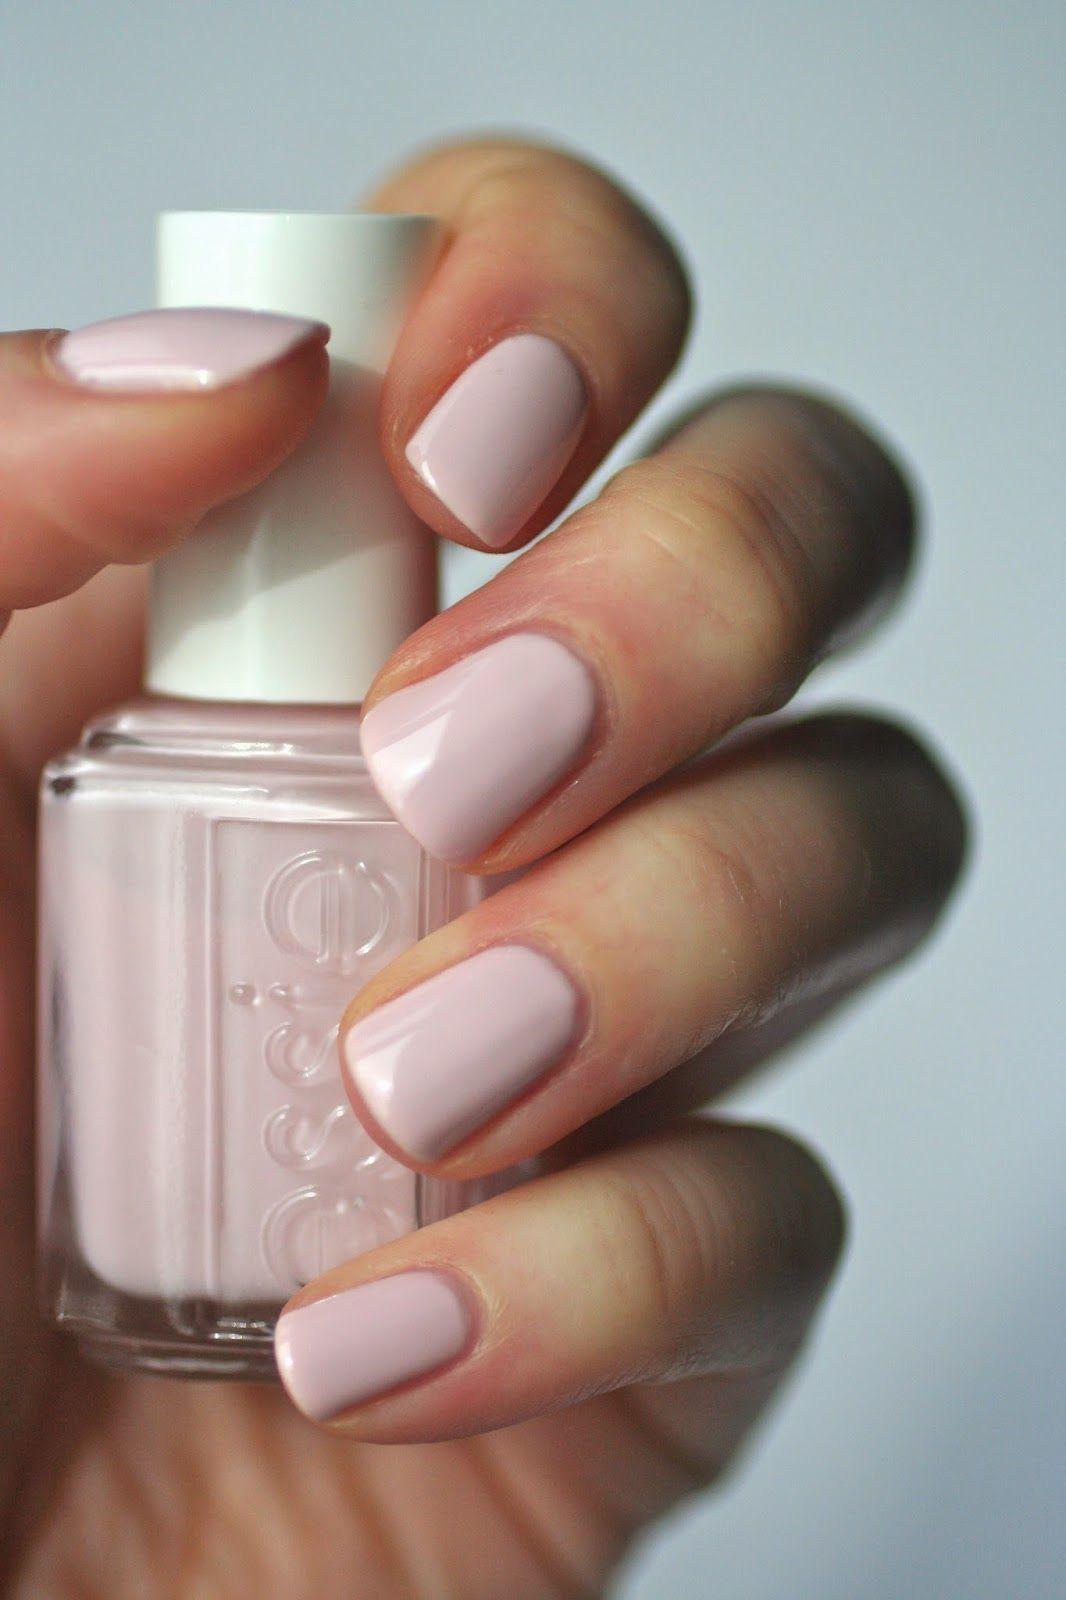 Essie Pale Pink Comparison Ballet Slippers Minimalistic Romper Room Fiji Nail Colors Manicure Essie Nail